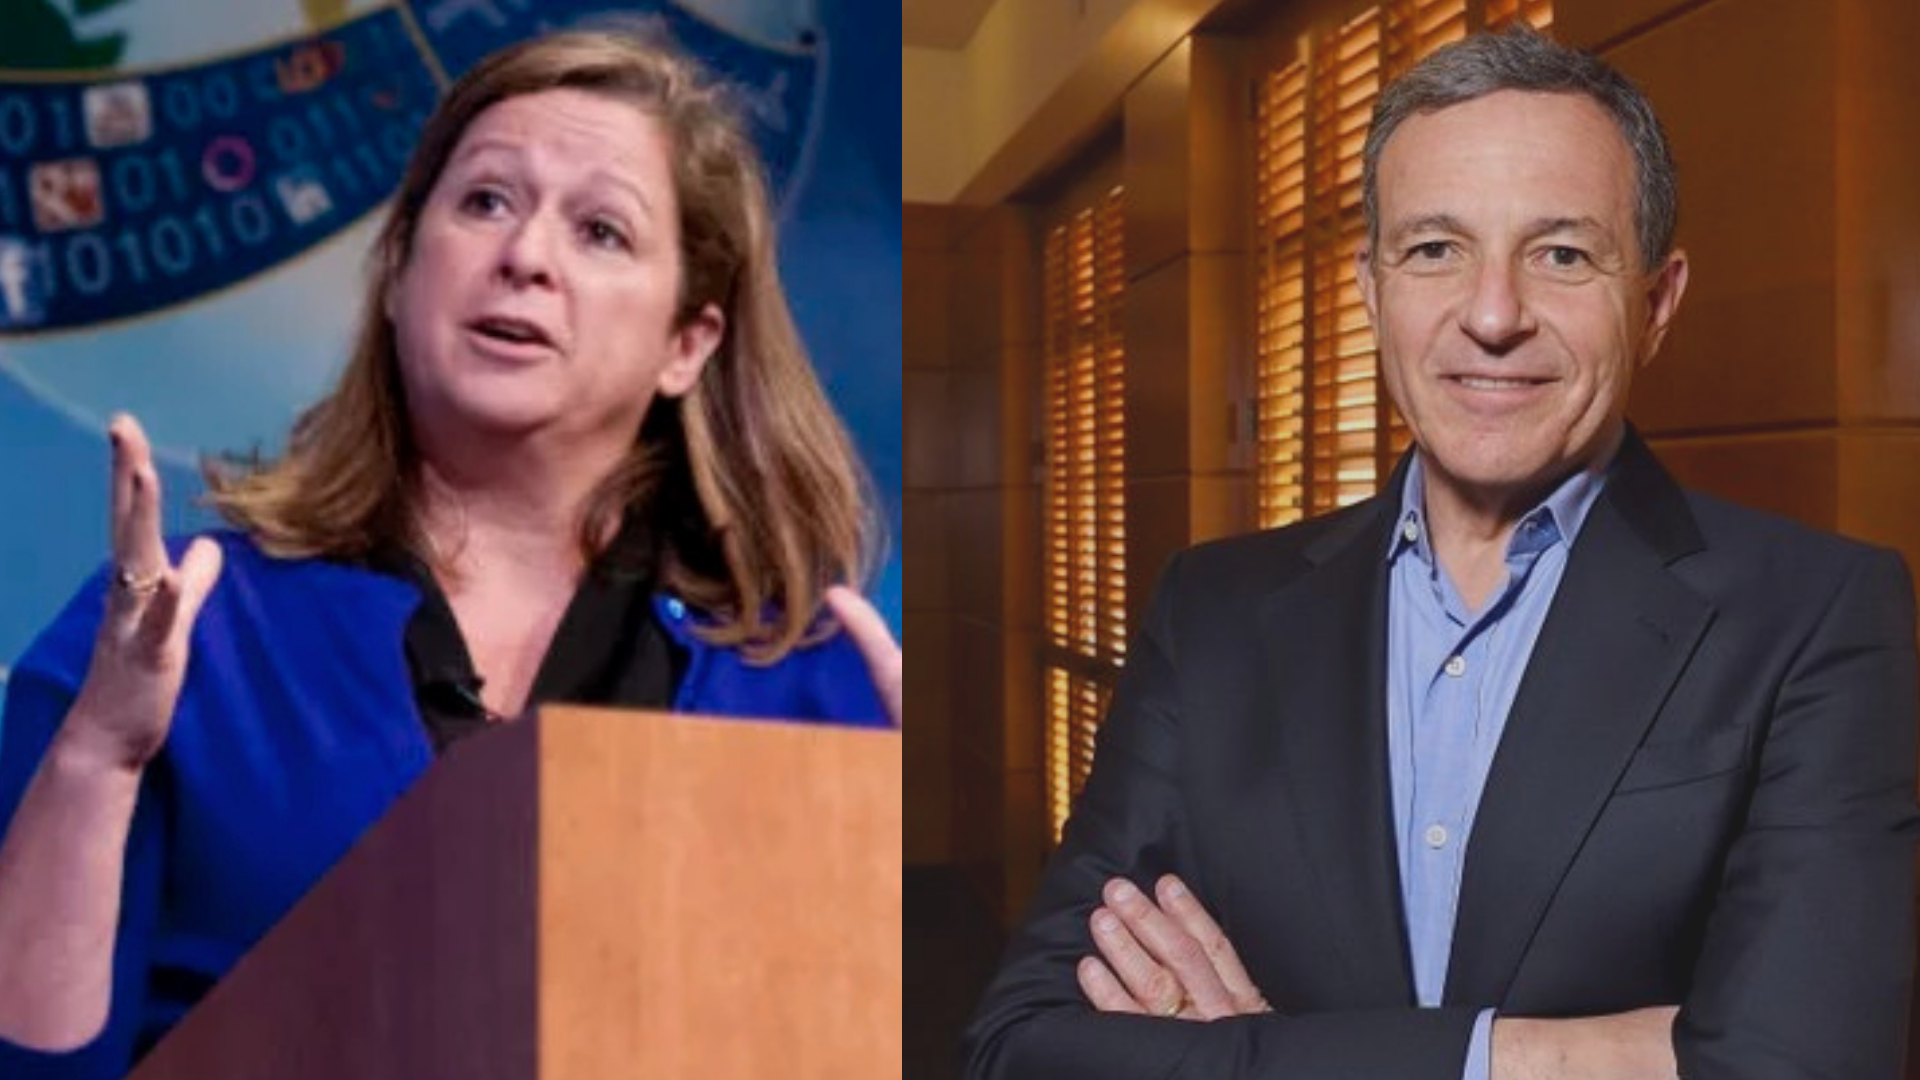 Abigail Disney, Walt's grandniece, calls Disney CEO's $65